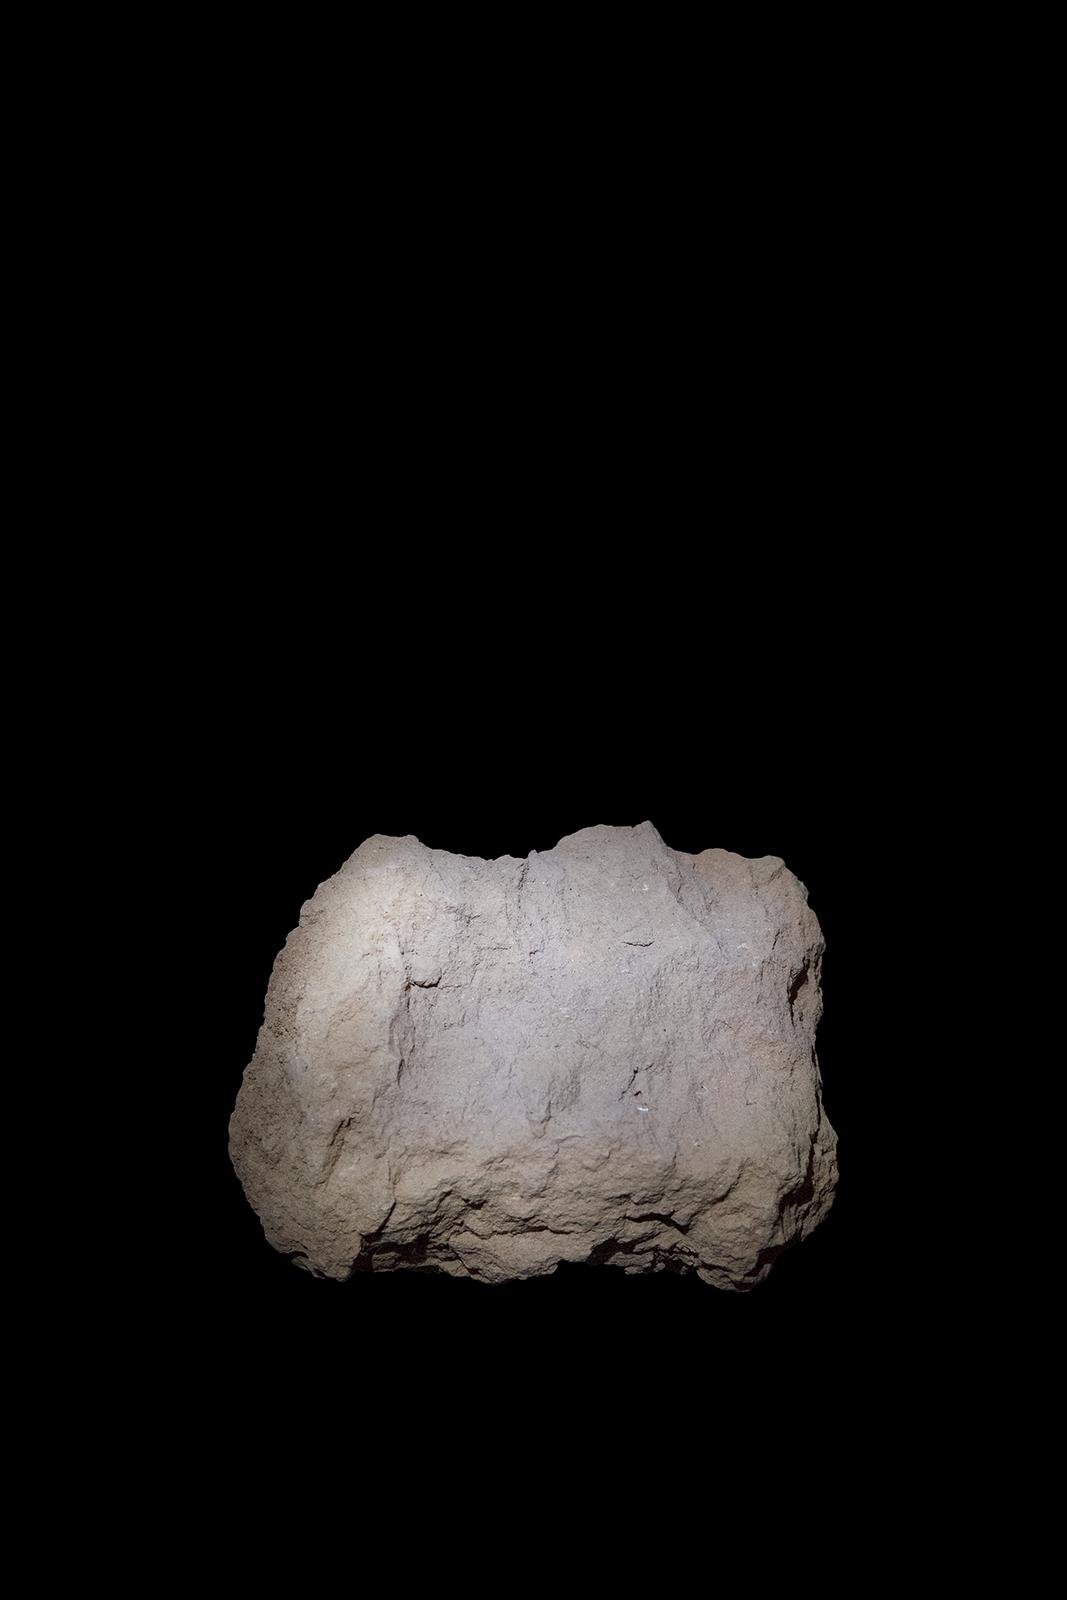 Глина, кар'єр поблизу шахти ім. Д.Ф. Мельникова/ Clay, a quarry near the Melnikov mine